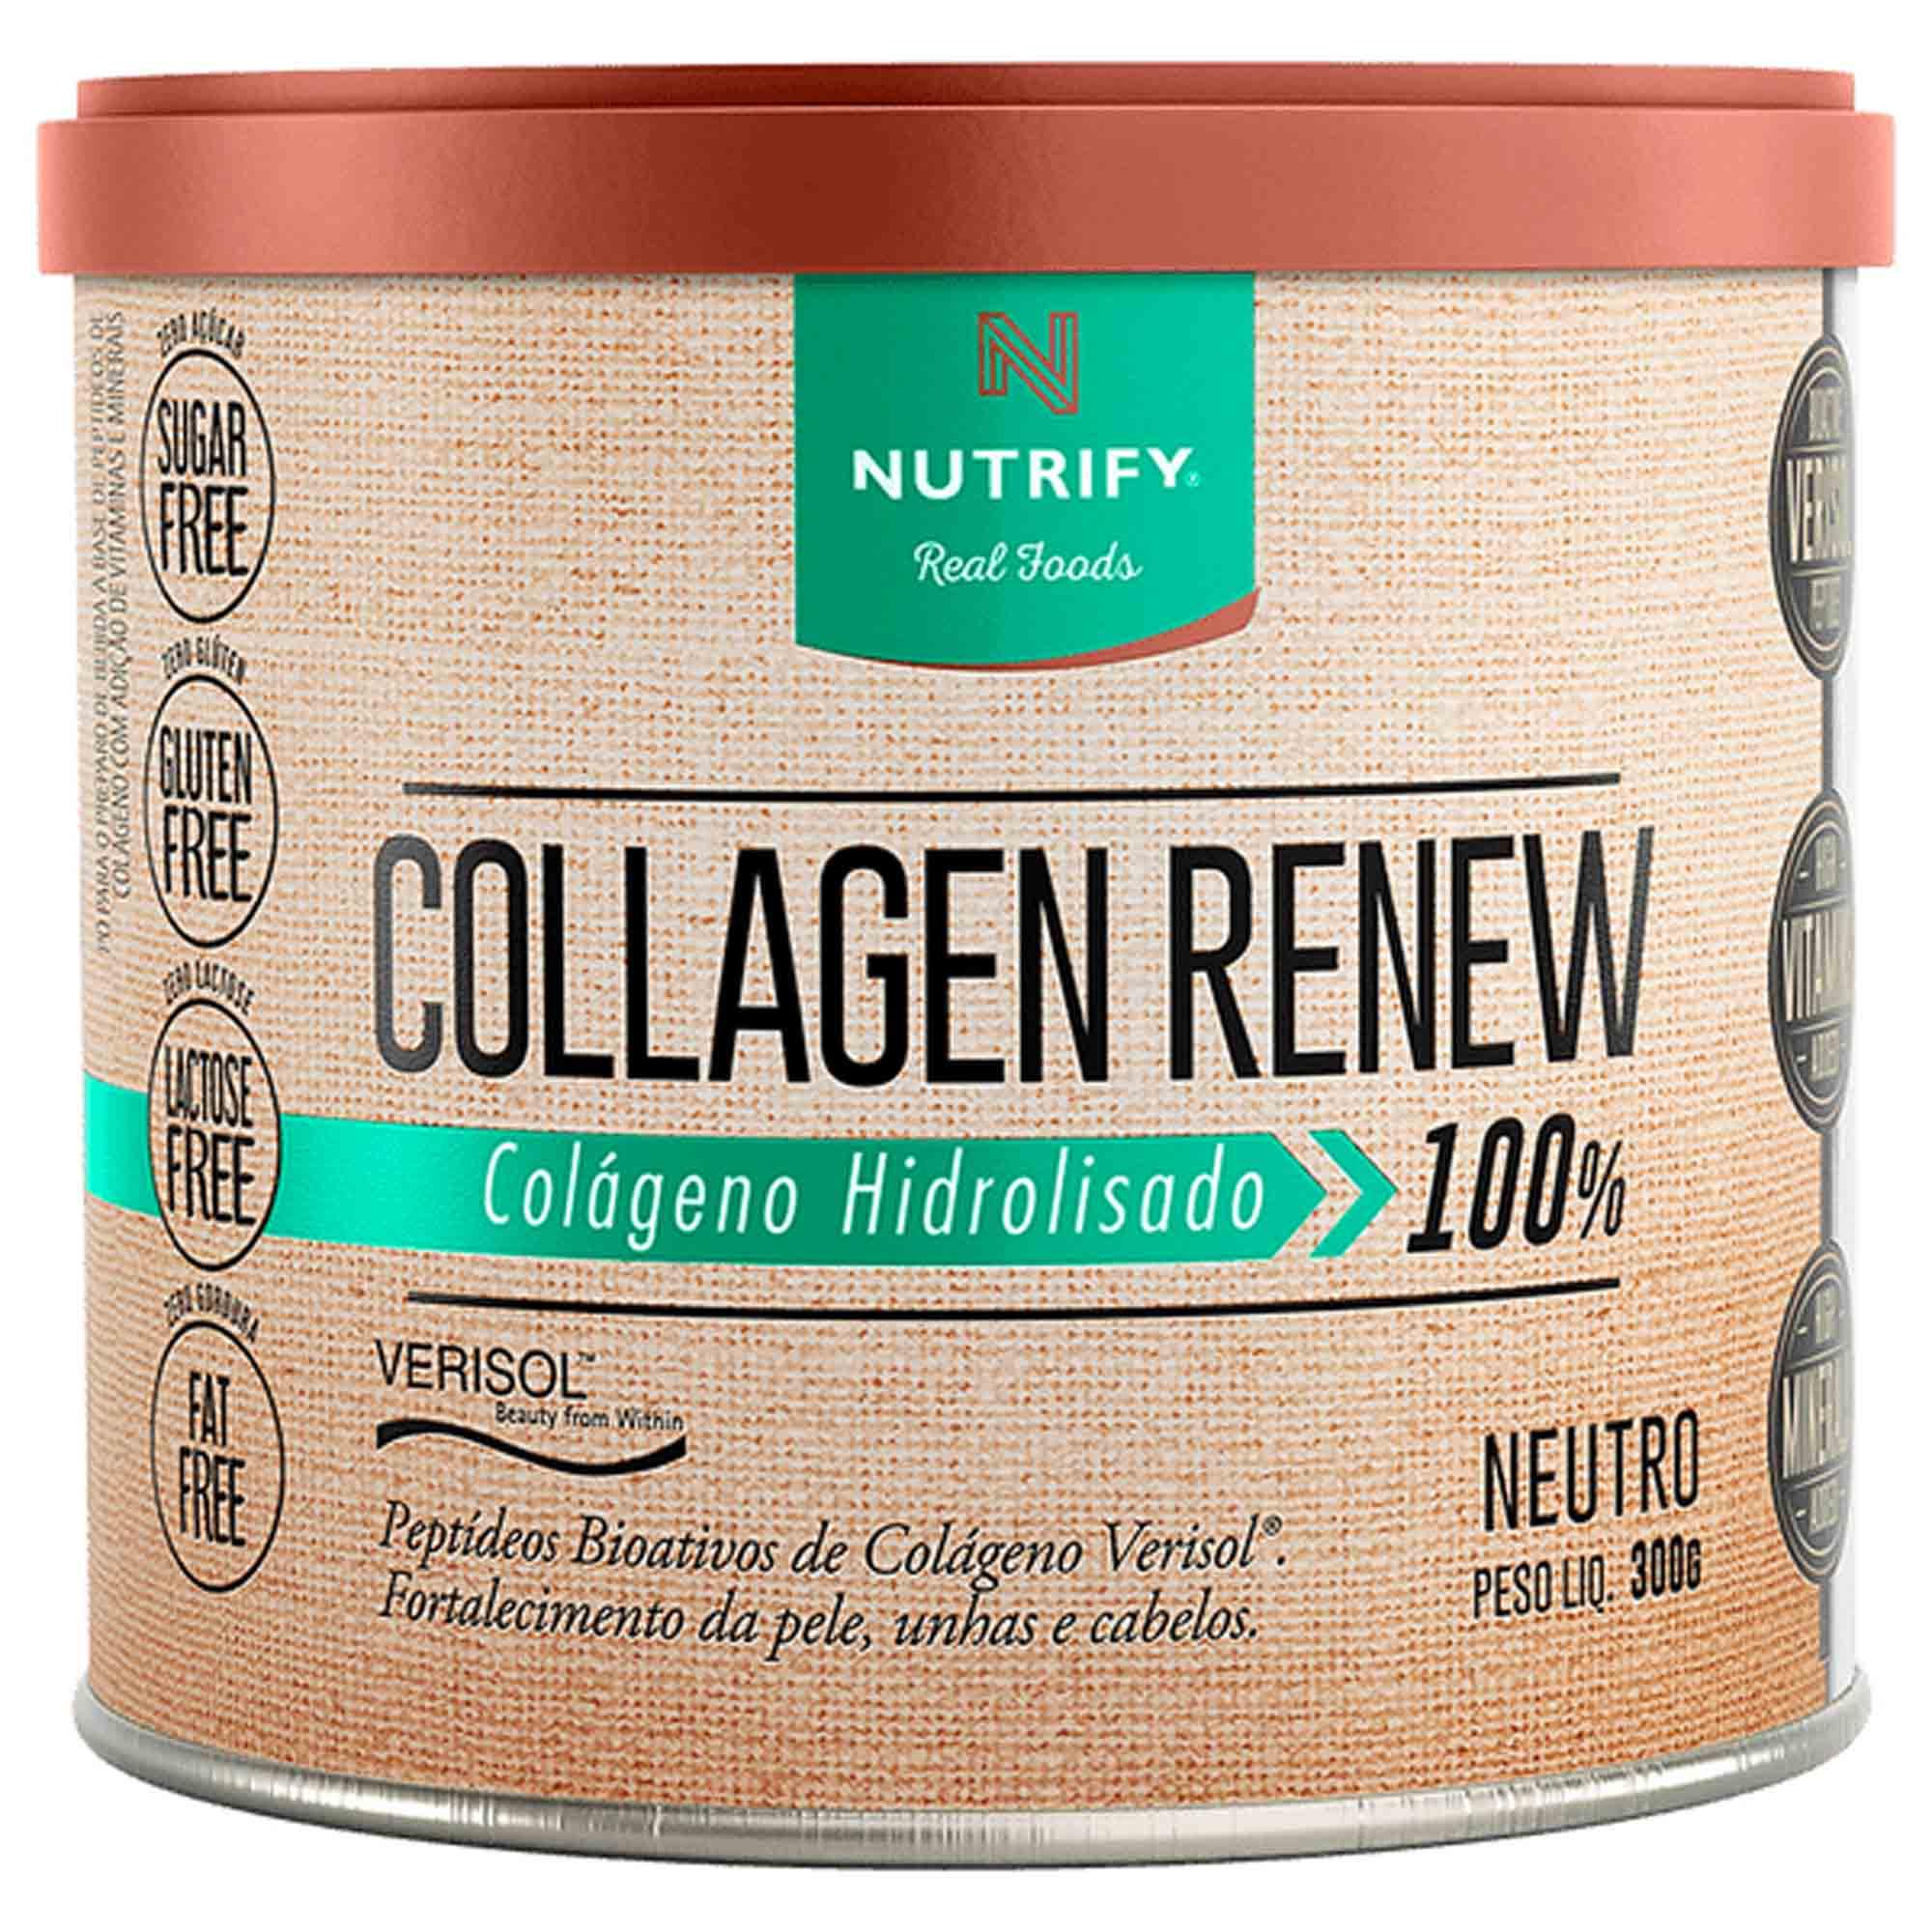 Collagen Renew sabor Neutro 300g Nutrify